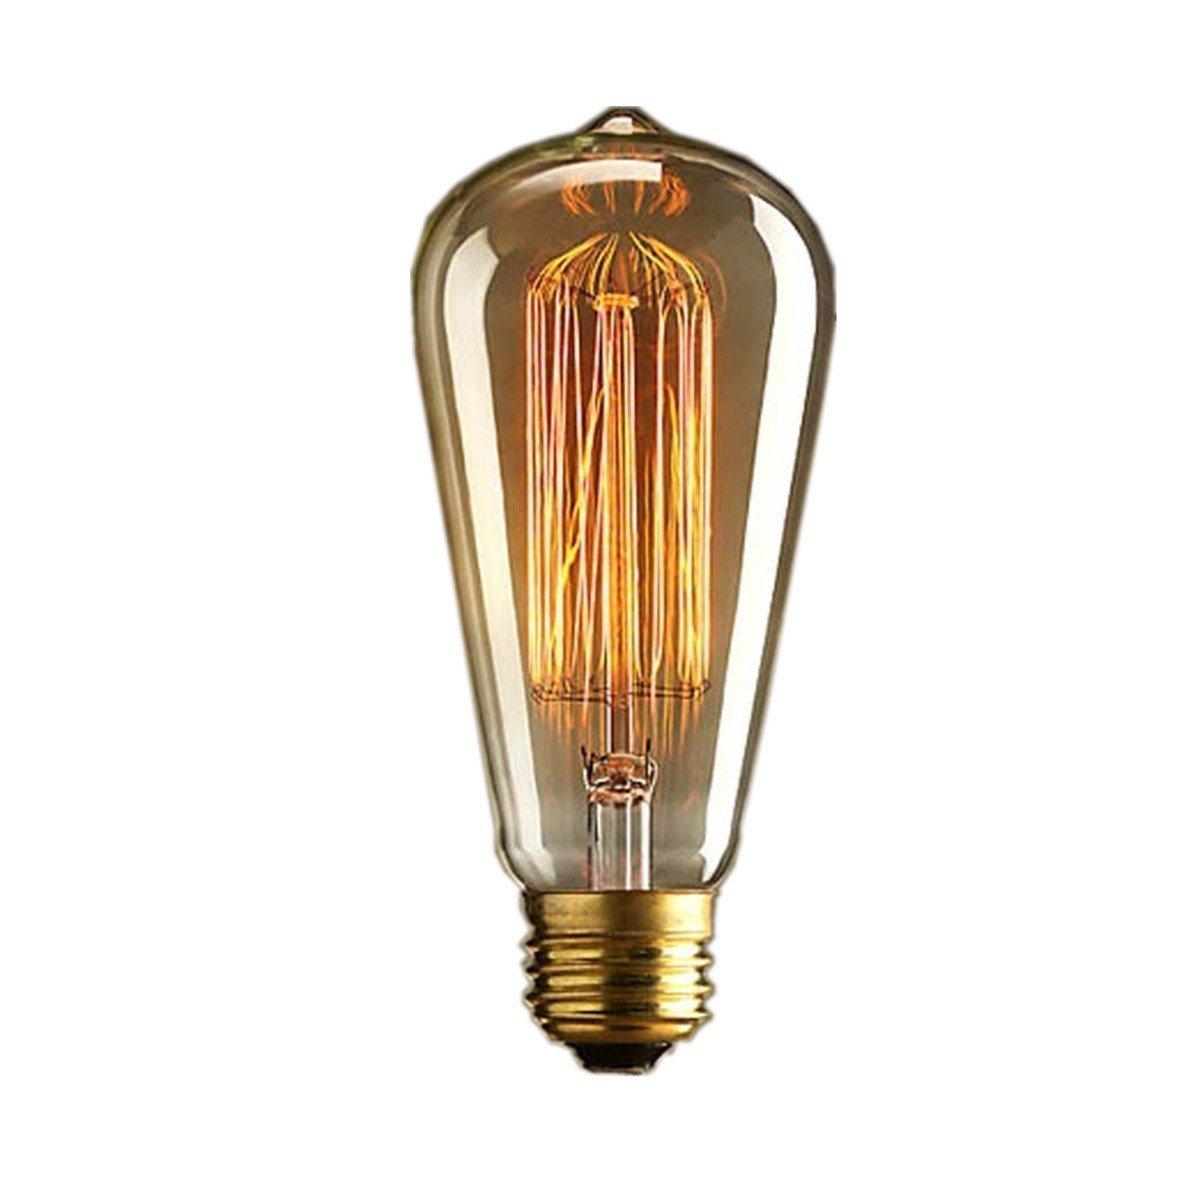 Lettuce 1x Vintage light bulb Retro old fashioned Edison Style E27